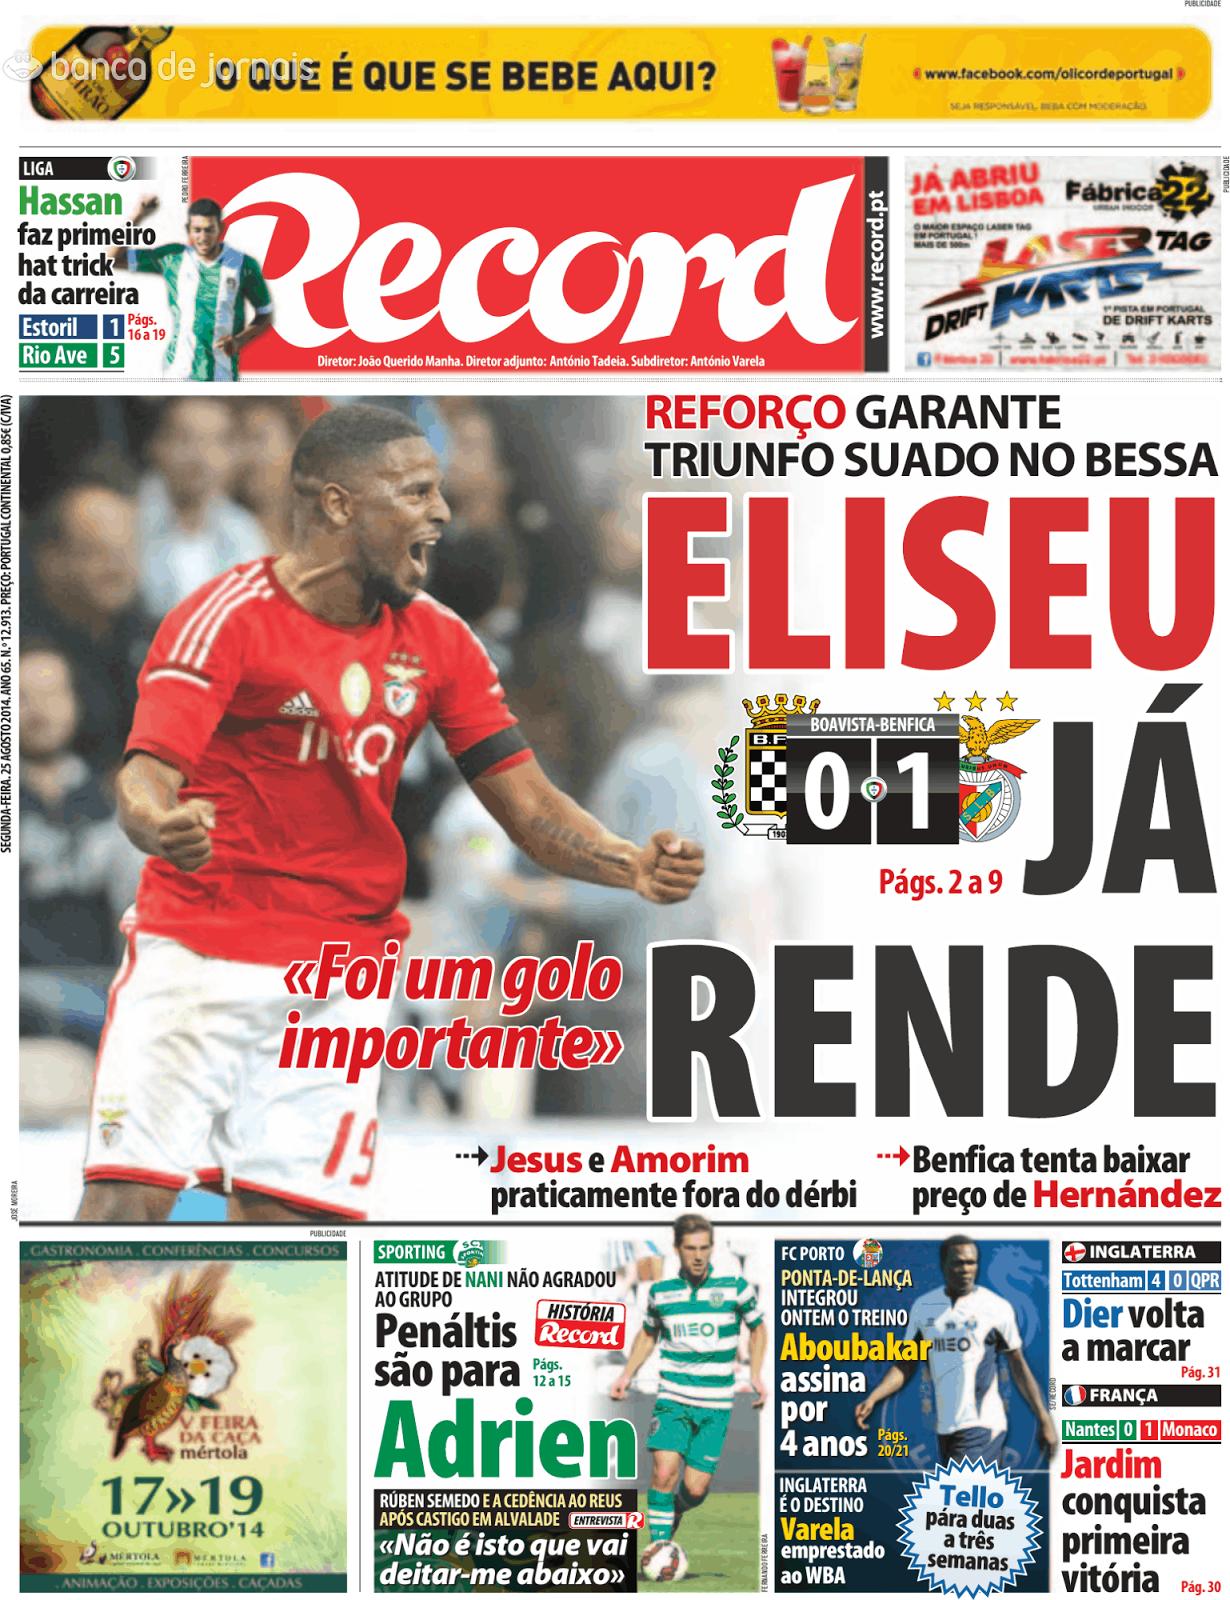 Capa do jornal Record de hoje  f6130aba877ce